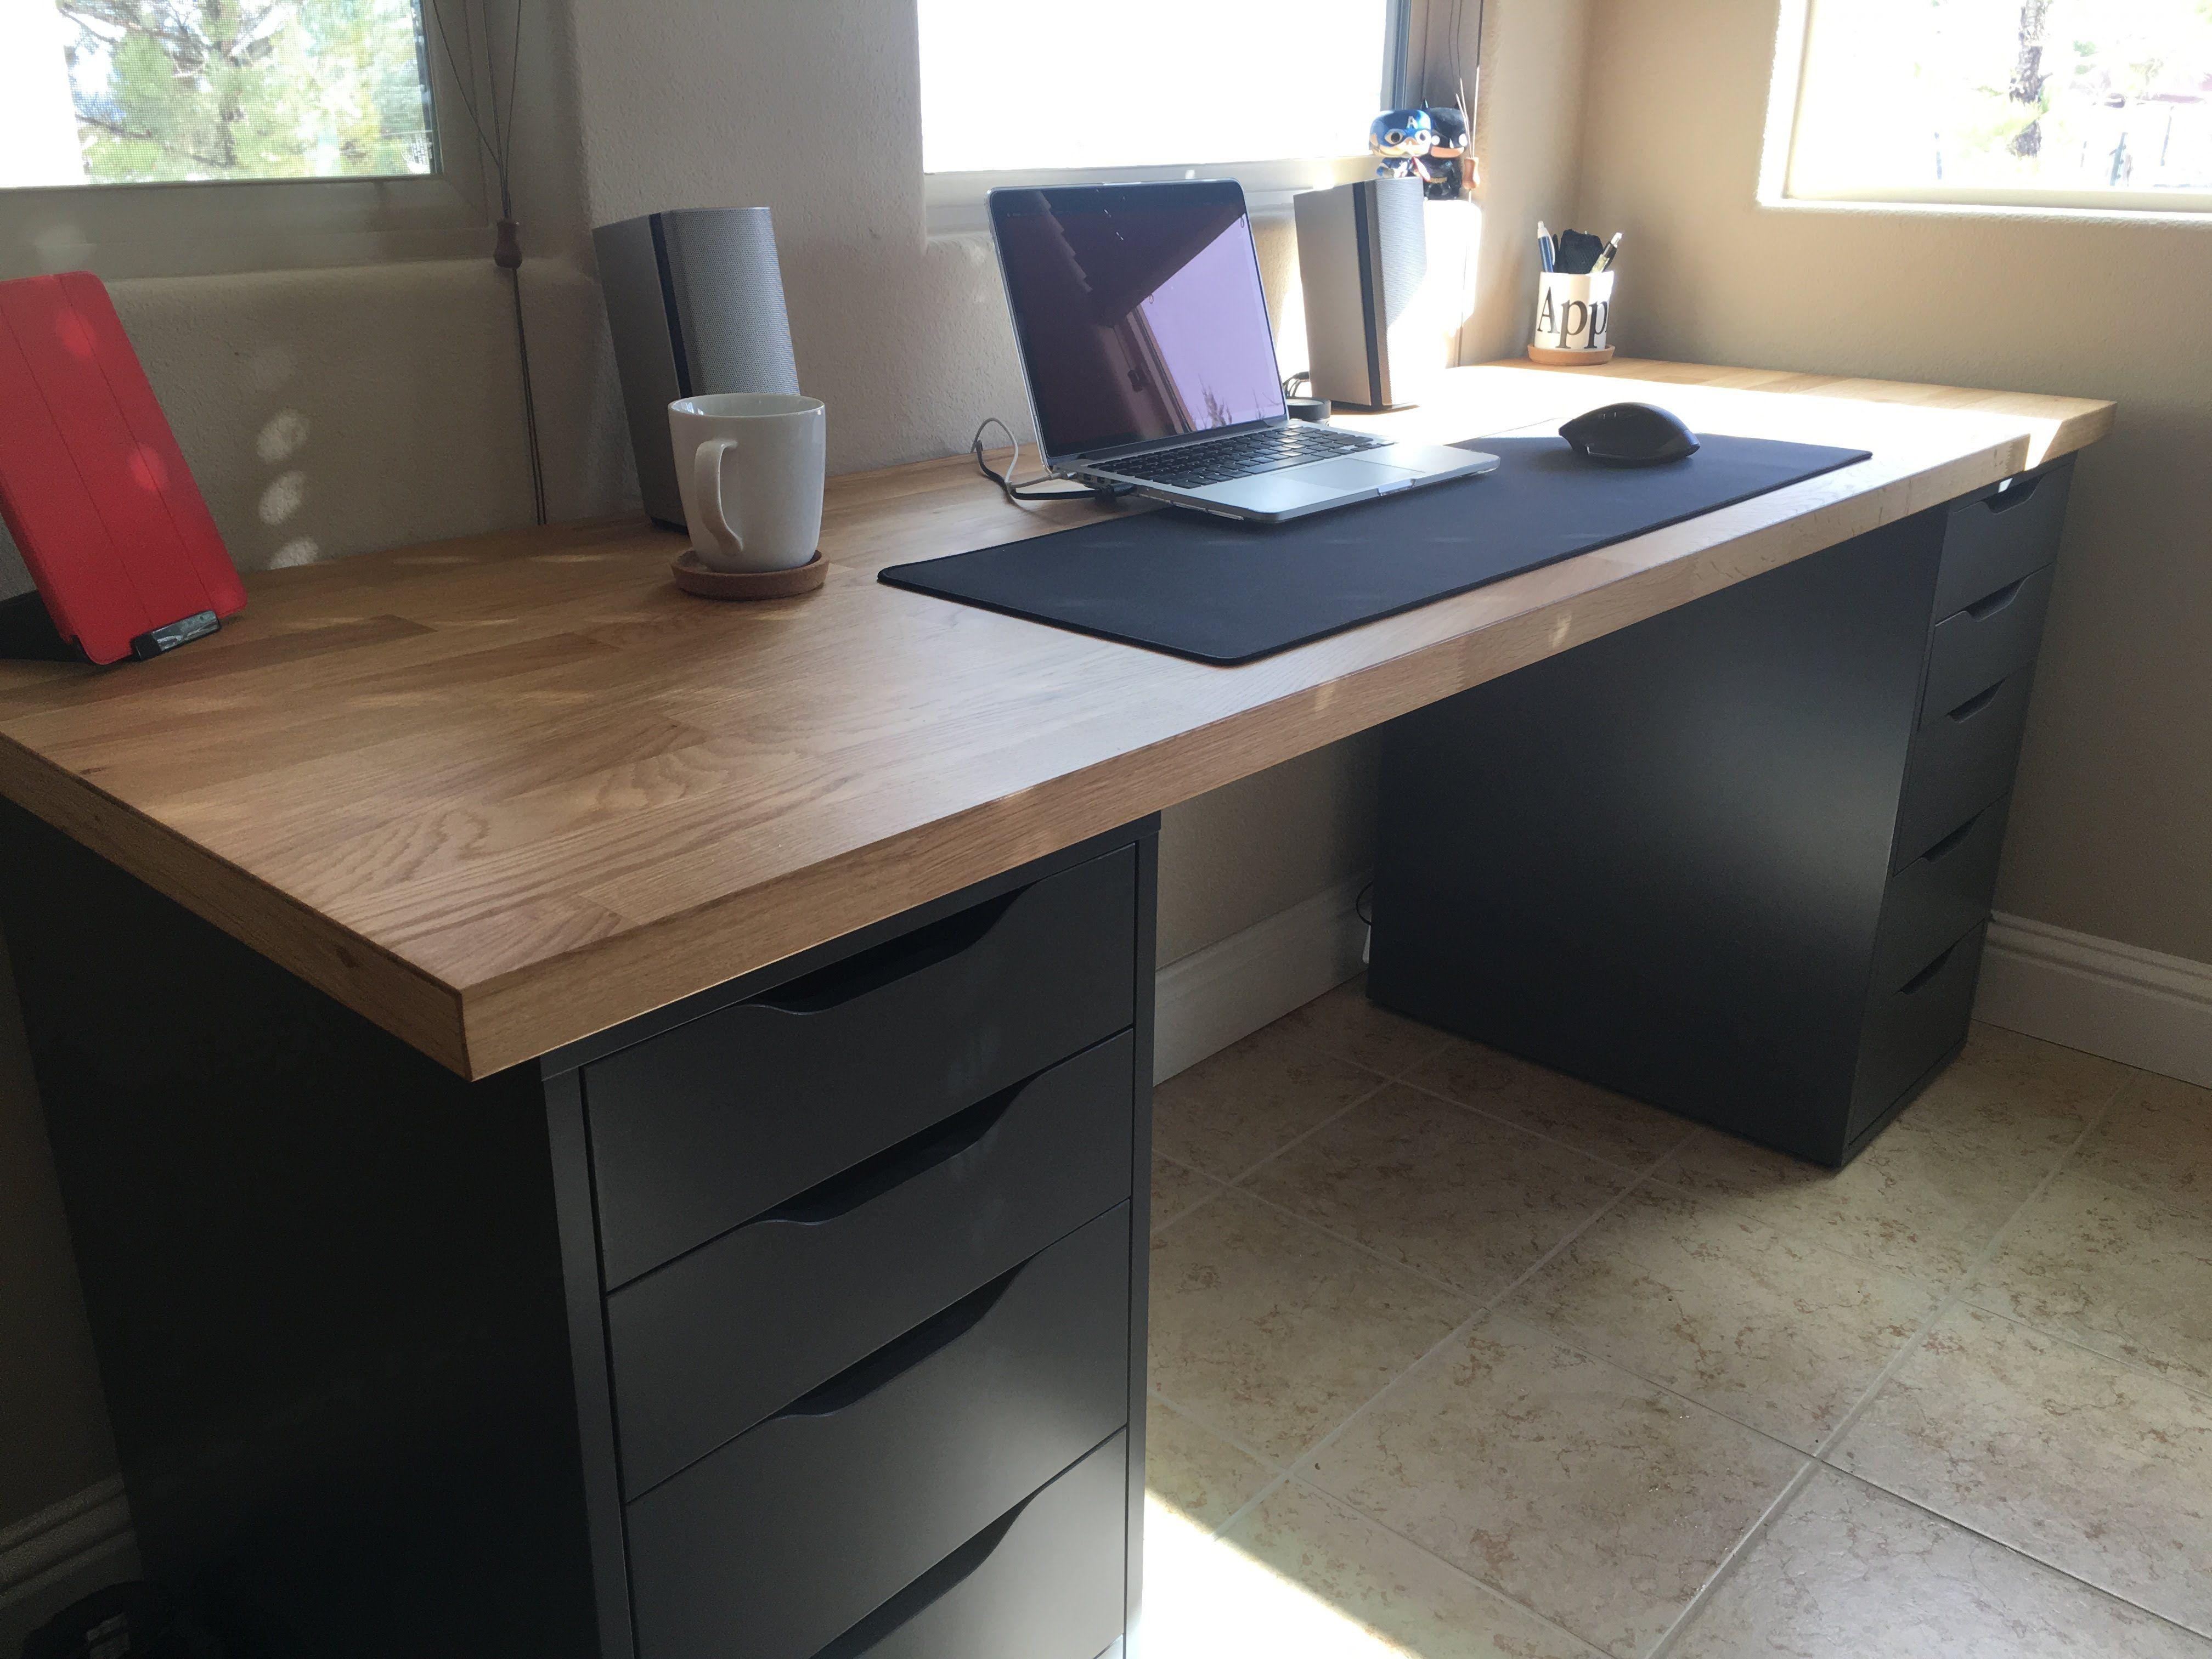 Counter Top Desks My Desk Set Up Home Office Pinterest Desks Apartments And